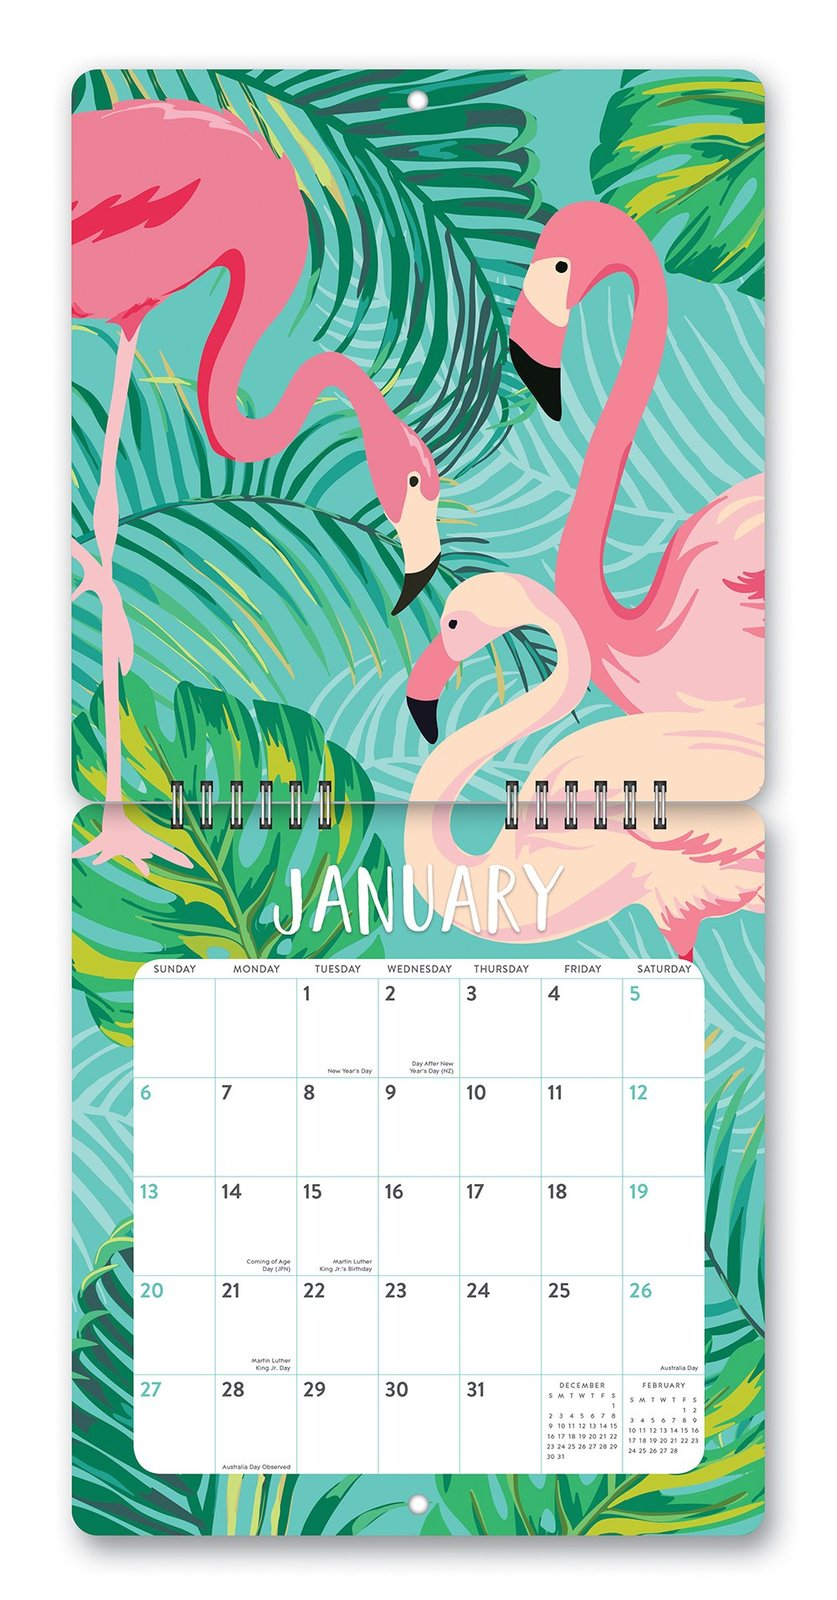 Studio Redux: No Bad Days 2019 Mini Wall Calendar image